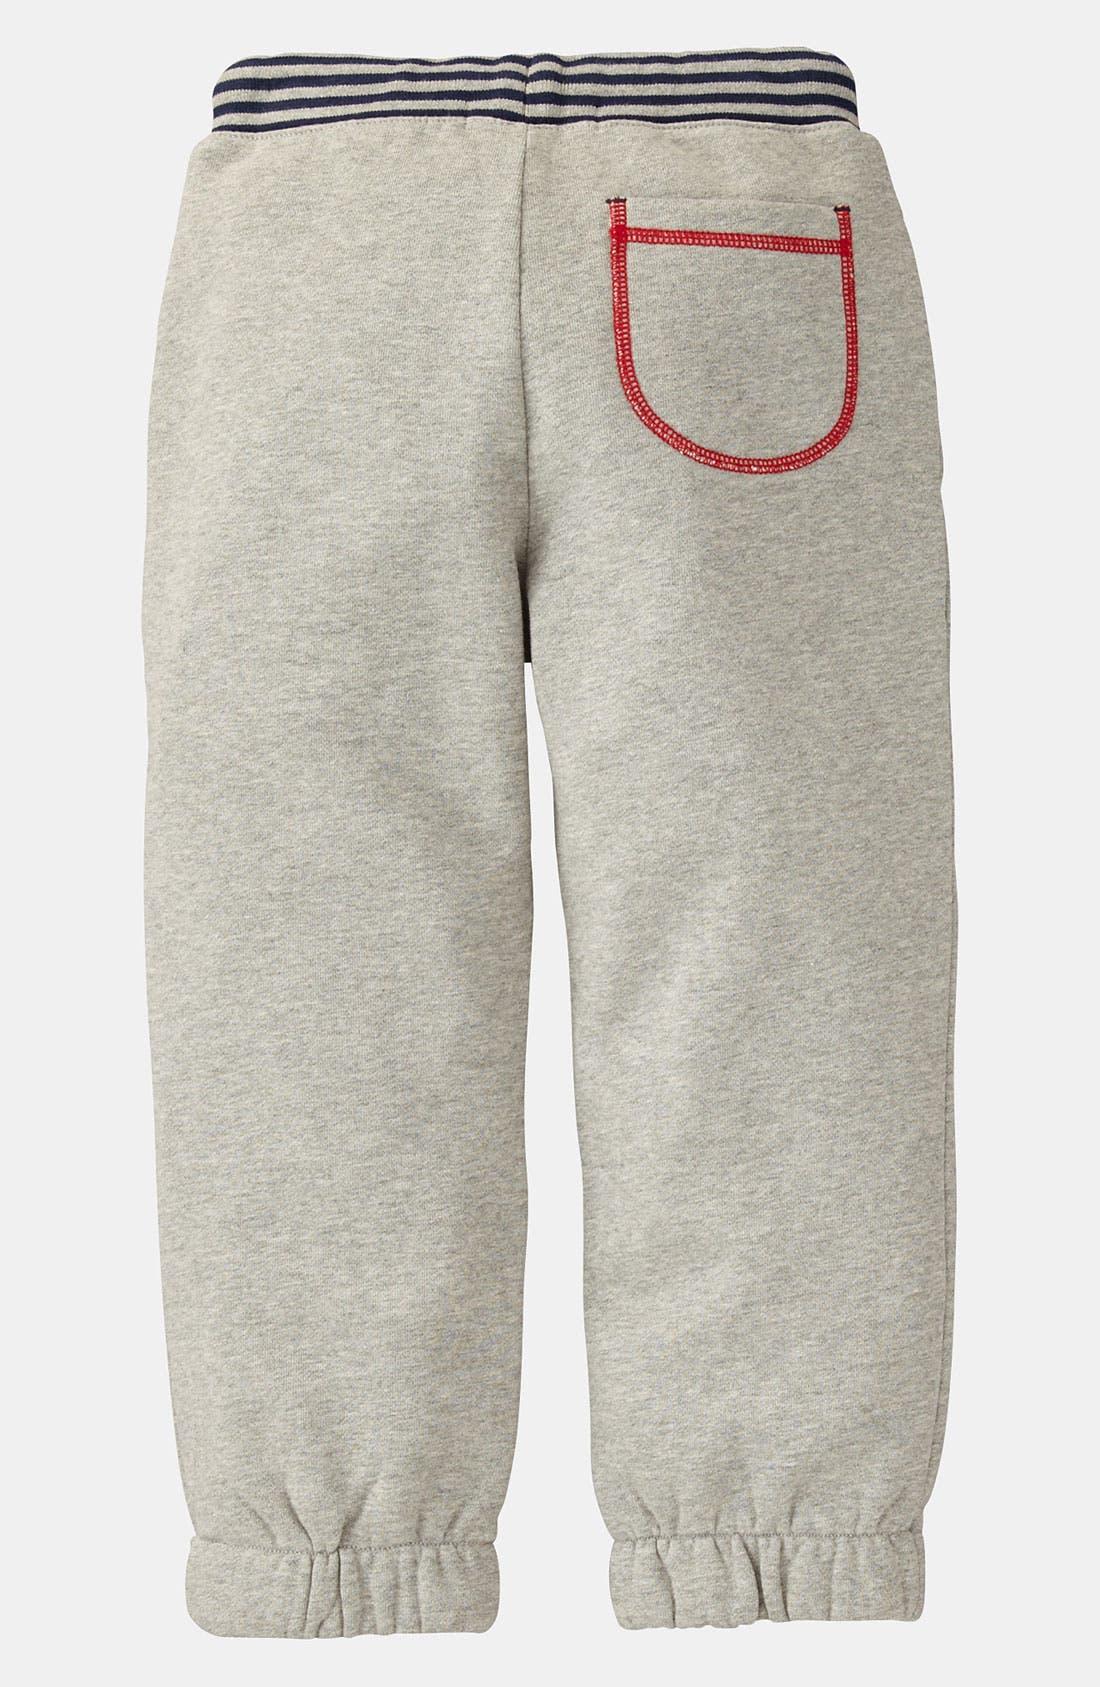 Alternate Image 2  - Mini Boden 'Track' Pants (Toddler)